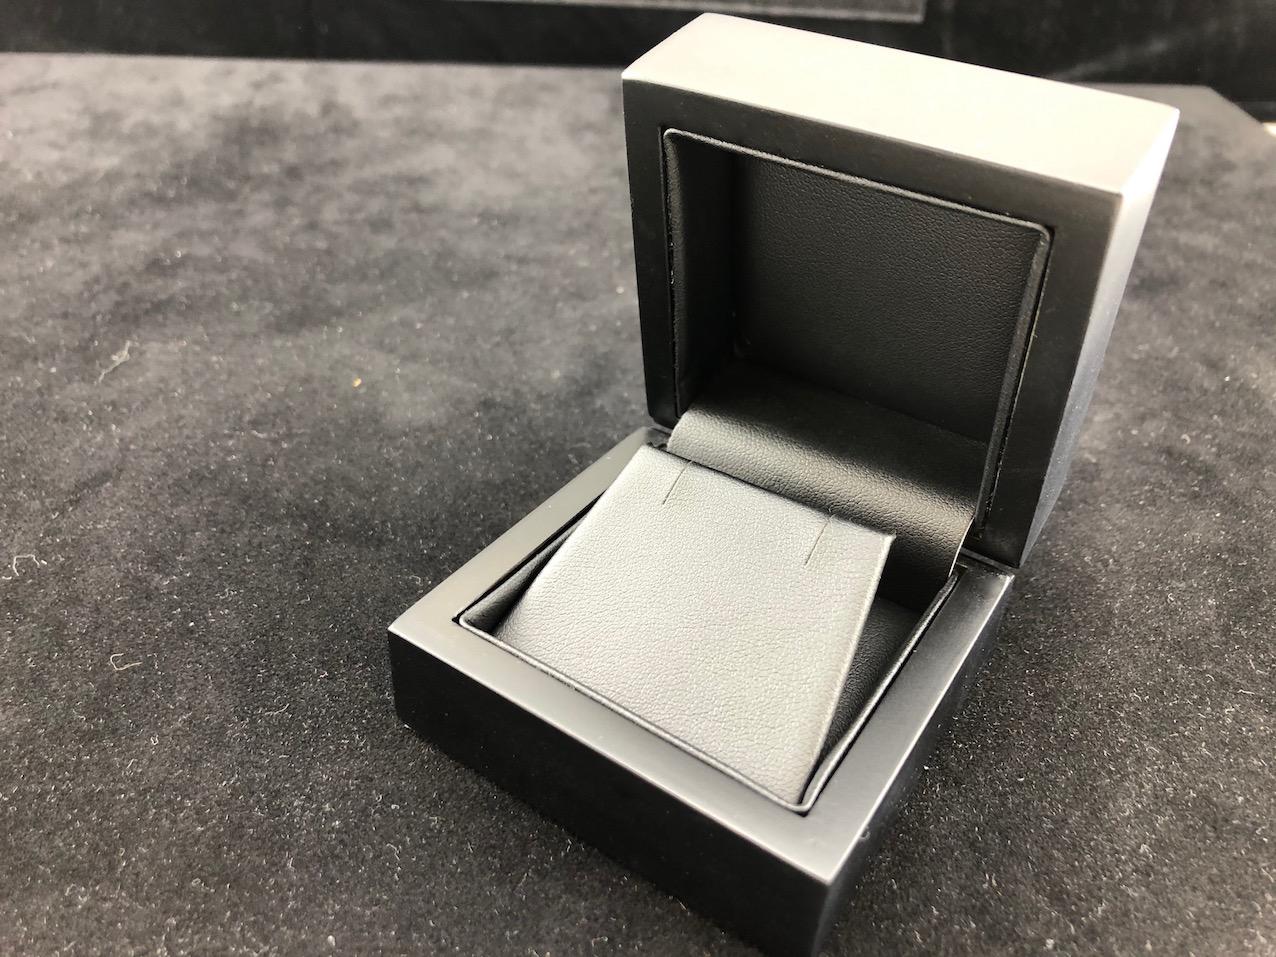 Matte Black, Black Leather Feel Interior, Ring Box